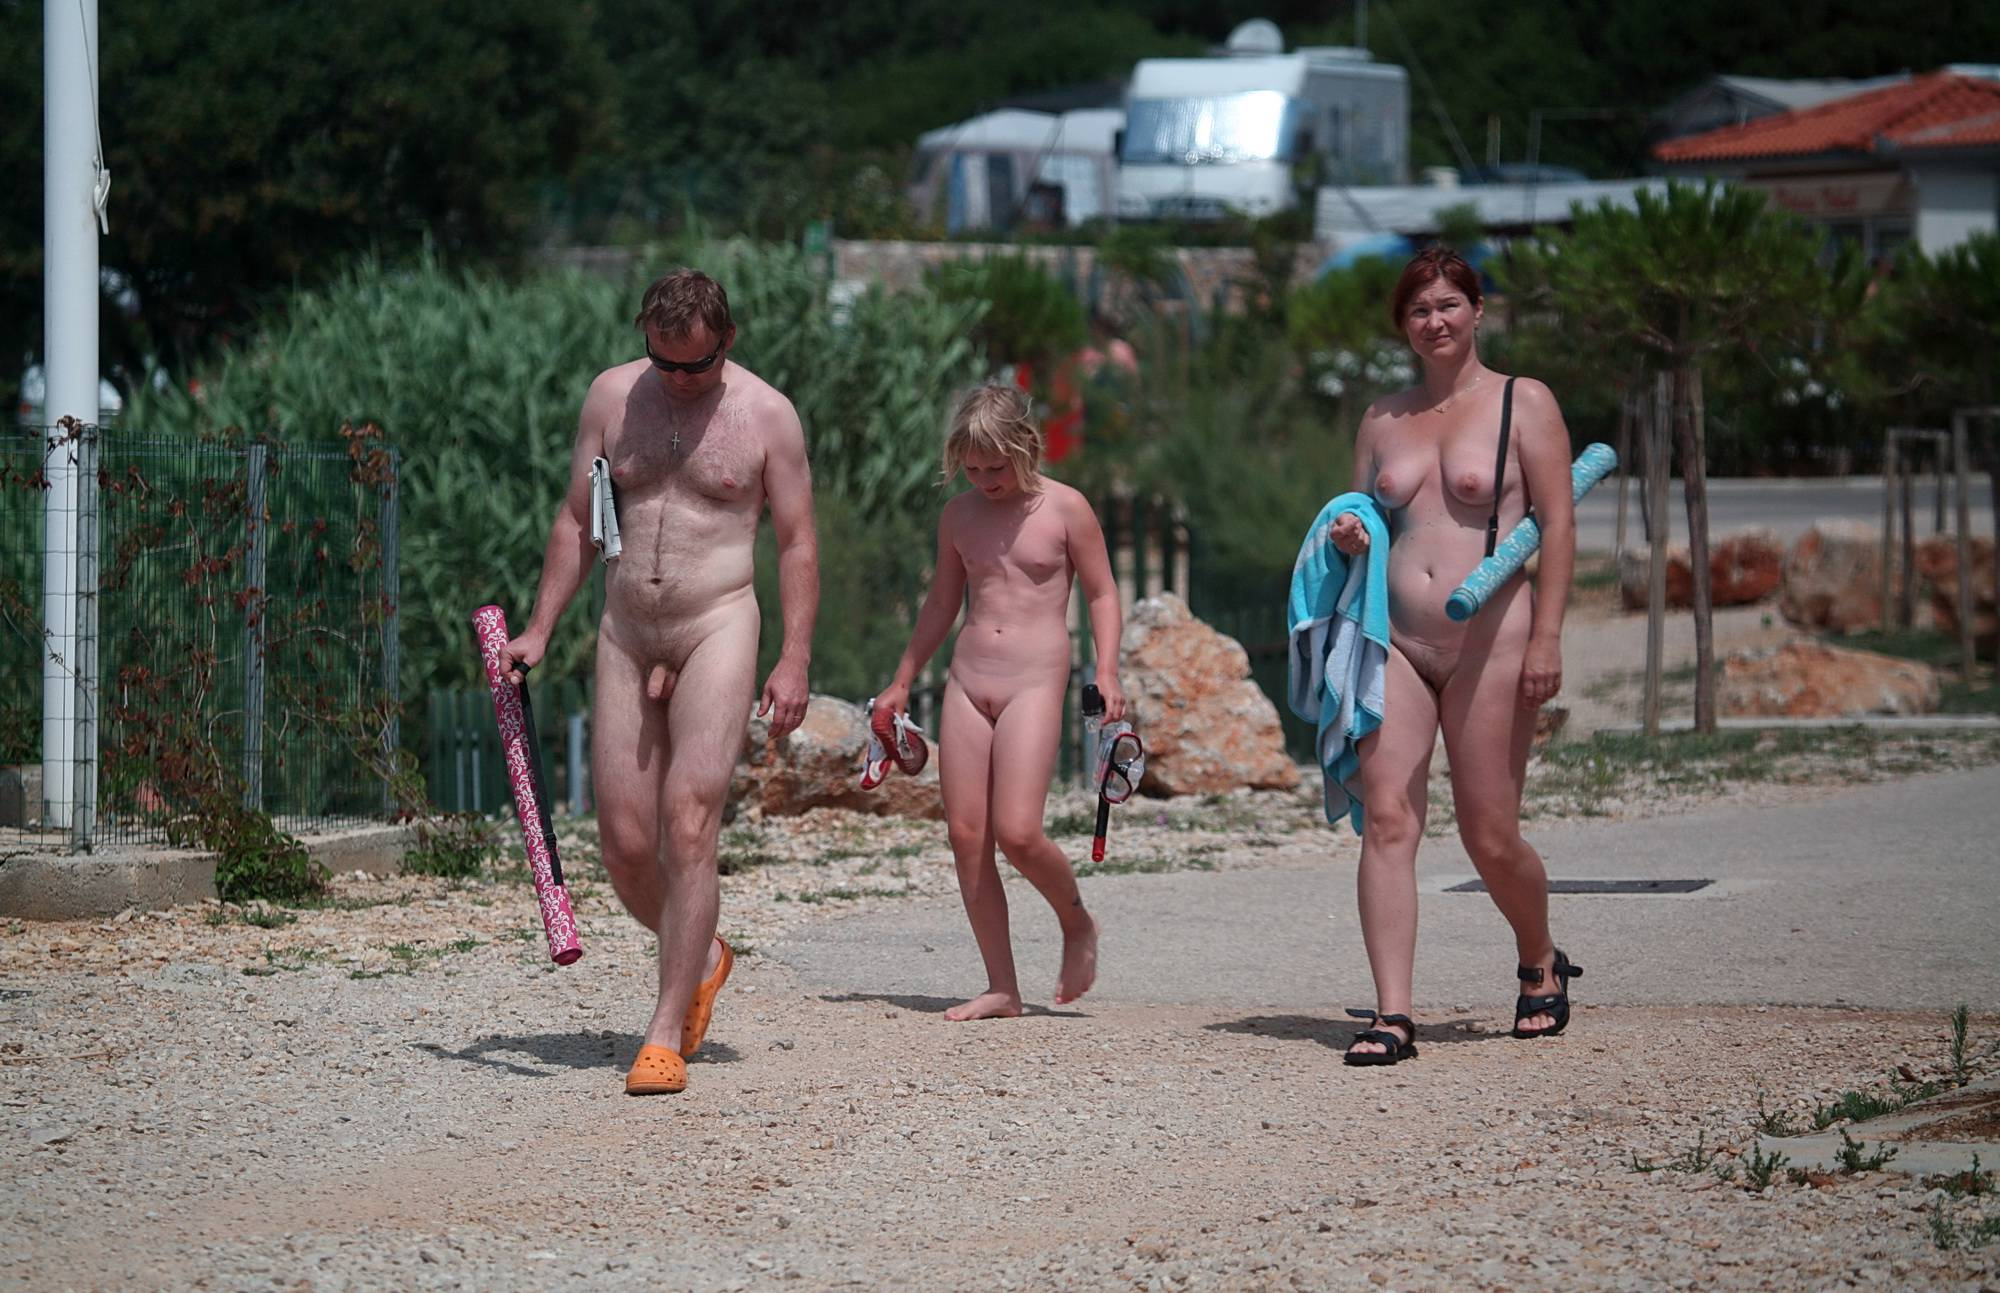 Nudist Gallery Afternoon Daytime Stroll - 2